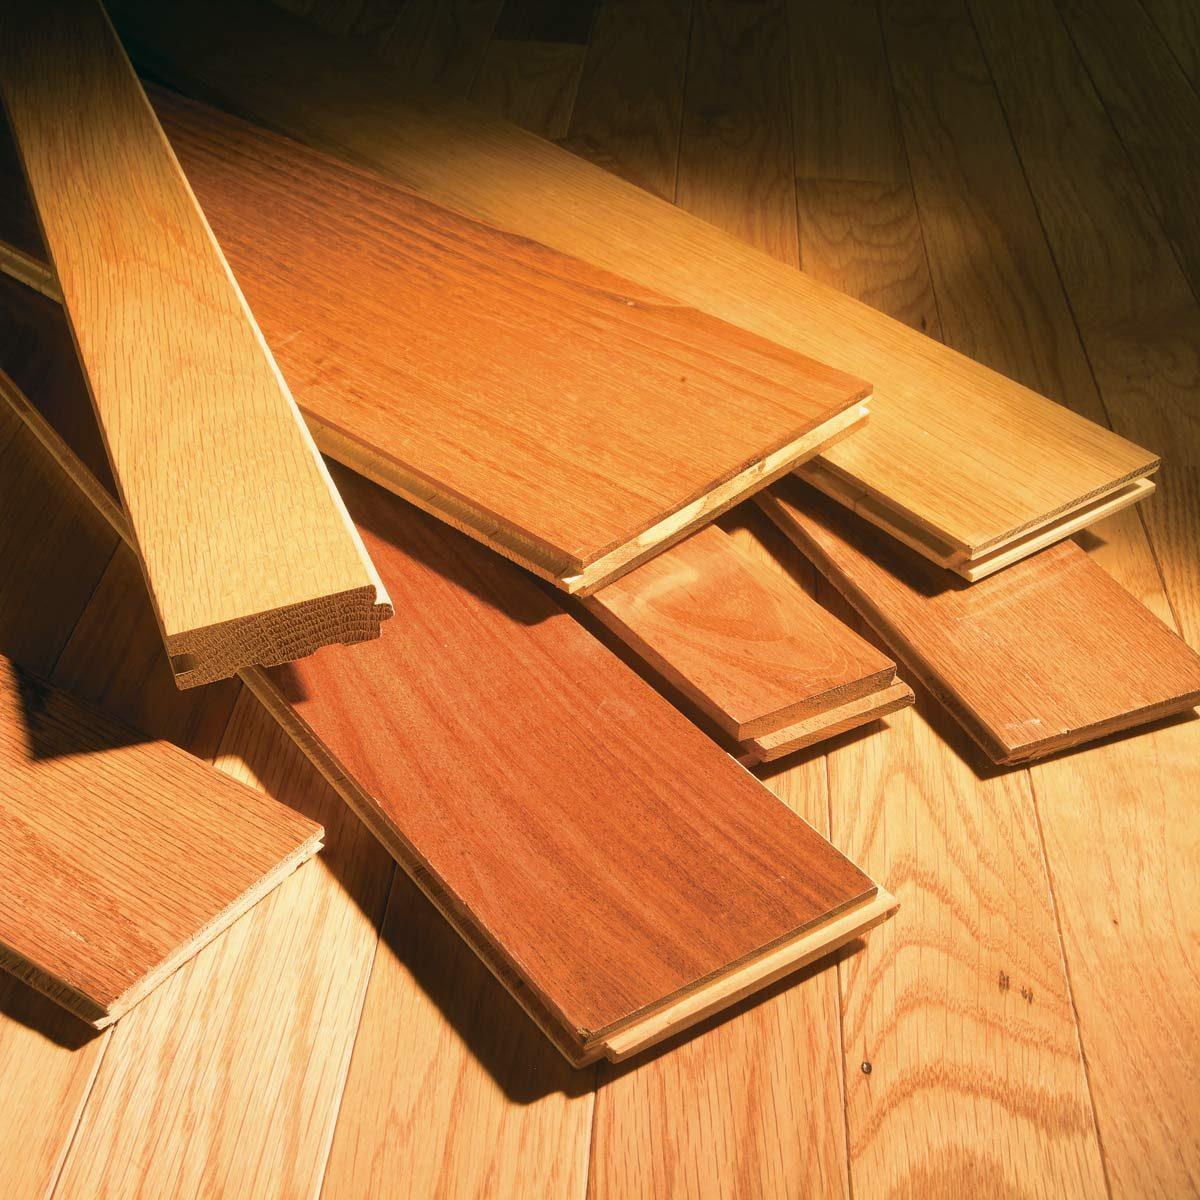 Identify Types of Wood